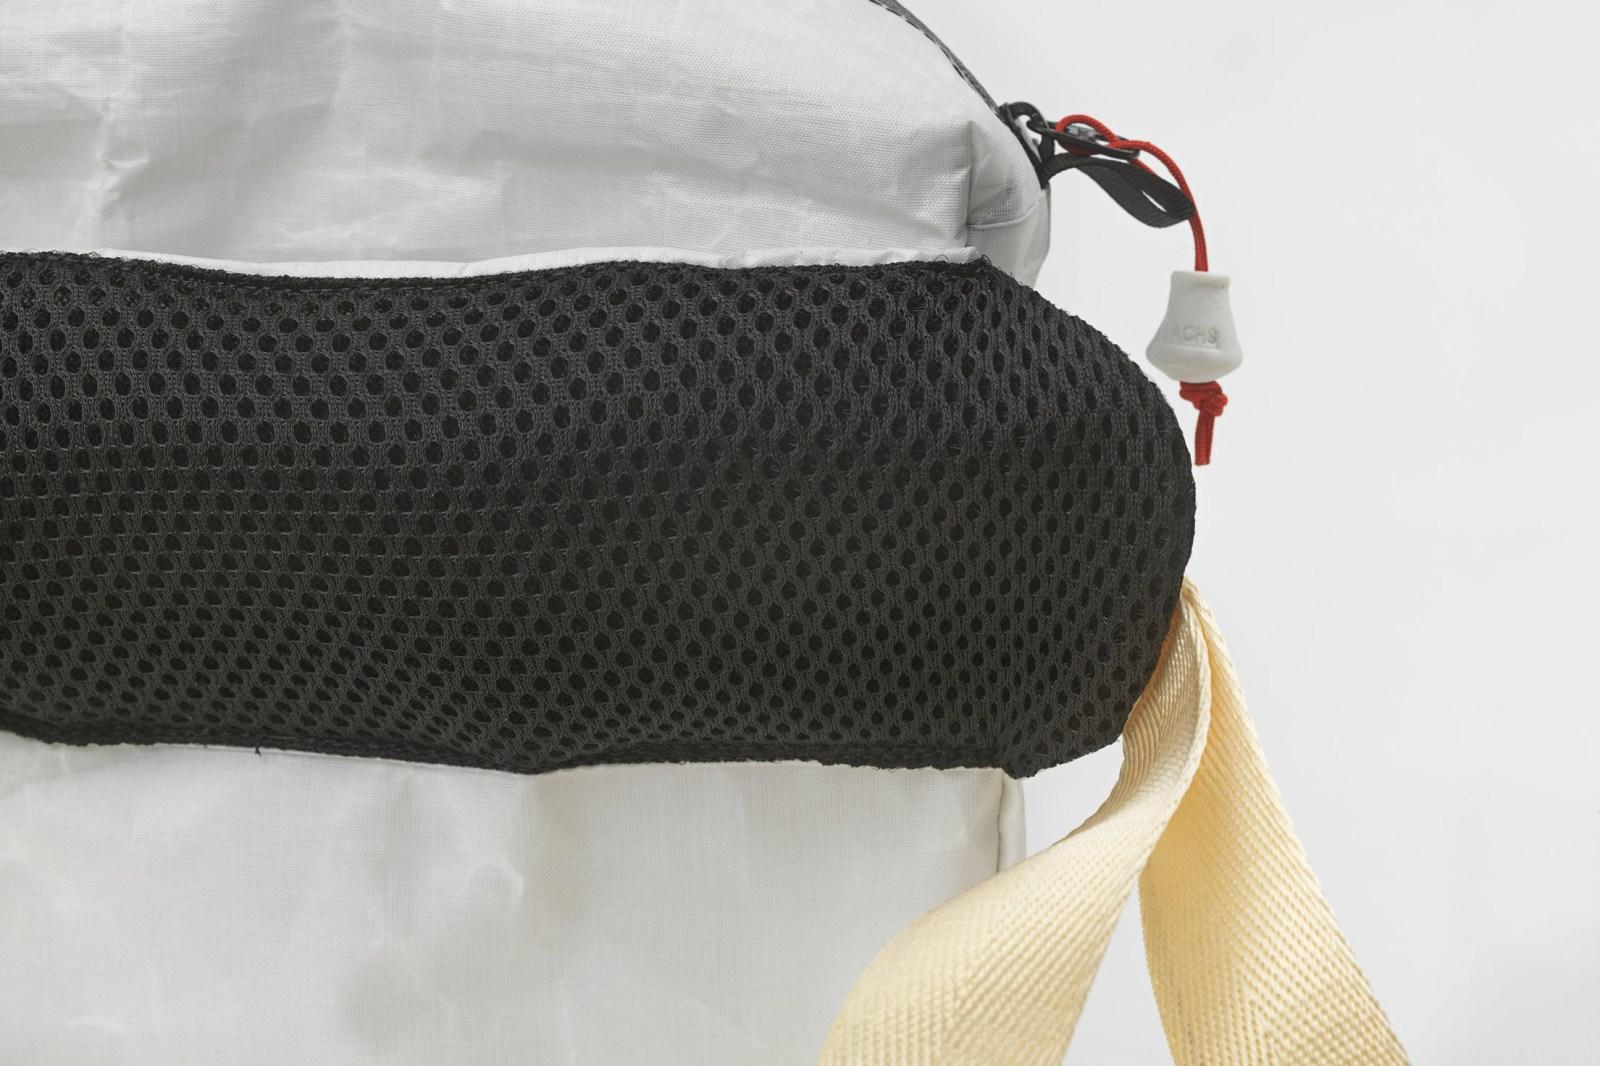 Tom Sachs 機能腰包及《Stranger Things》x Nike 聯名系列等本週不容錯過的 8 項新品發售